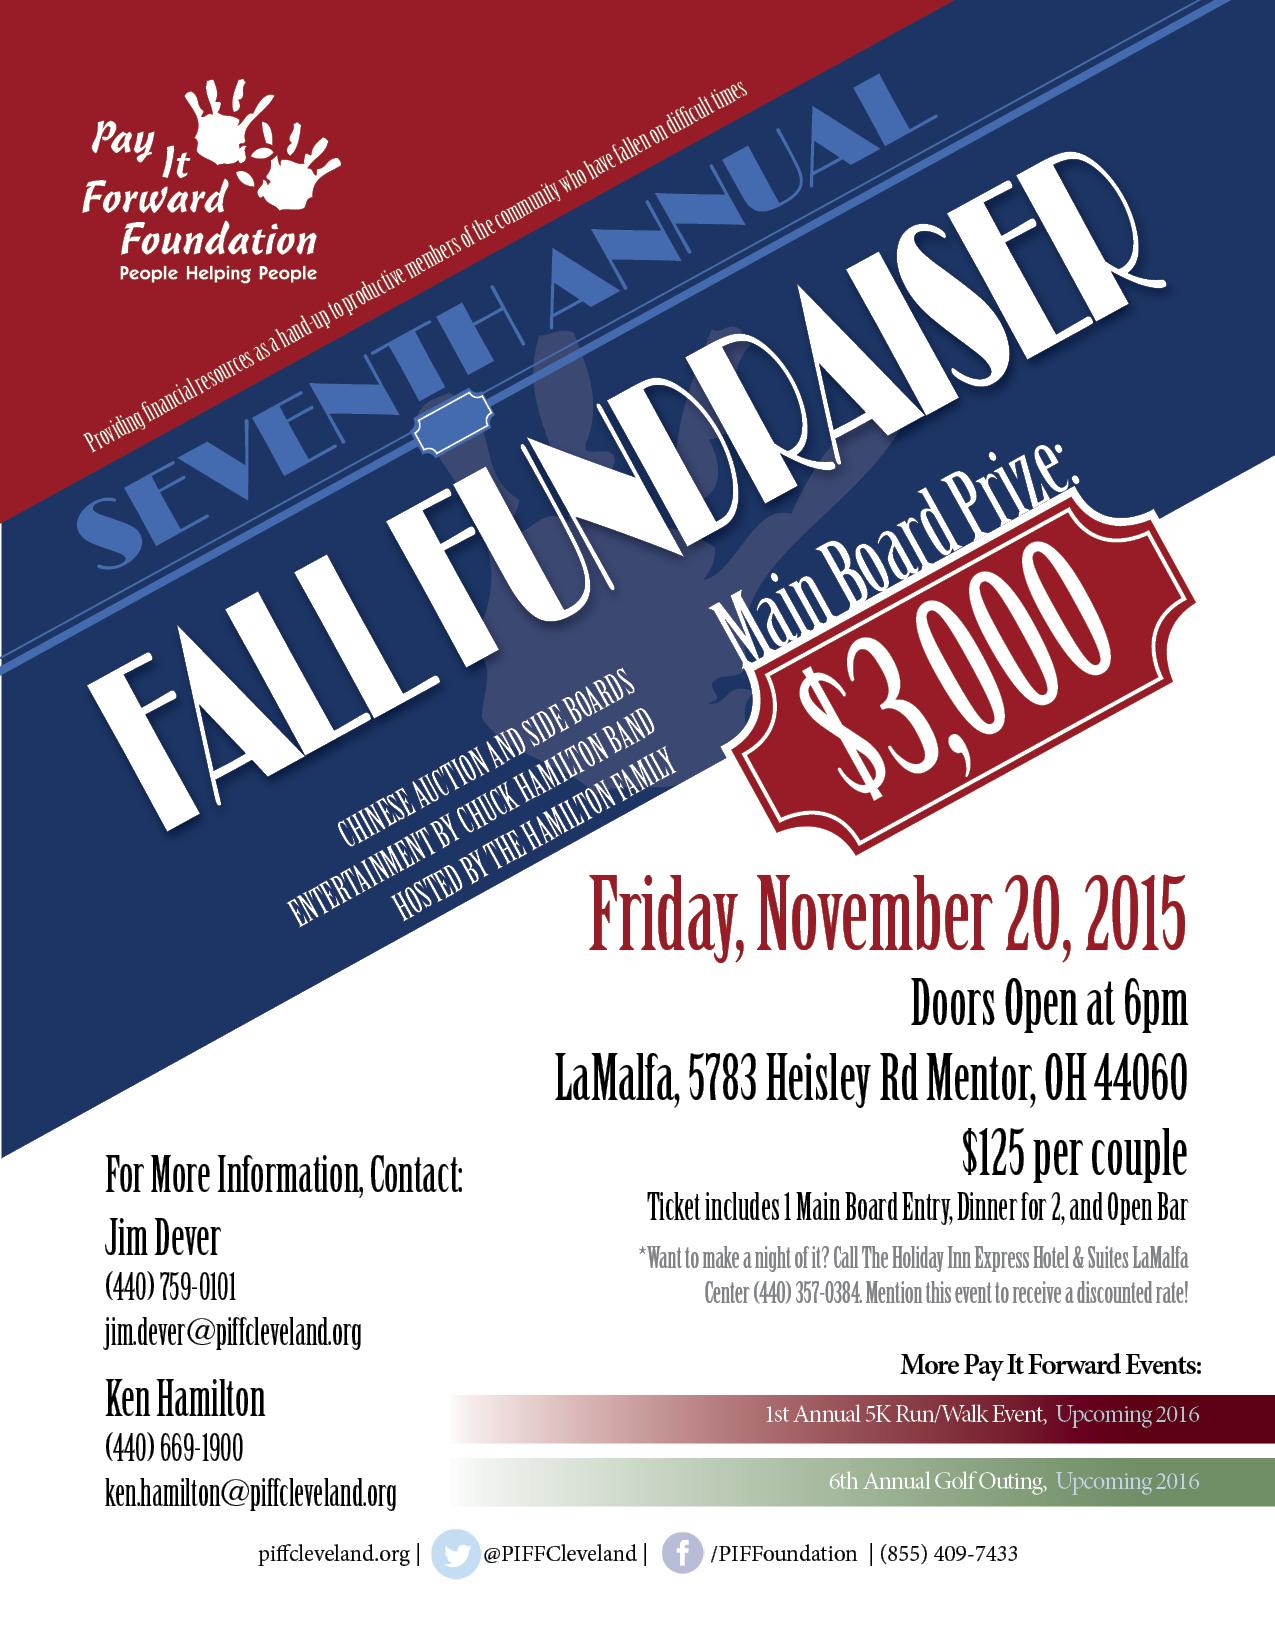 Pay It Forward Foundation Seventh Annual Fall Fundraiser Flier